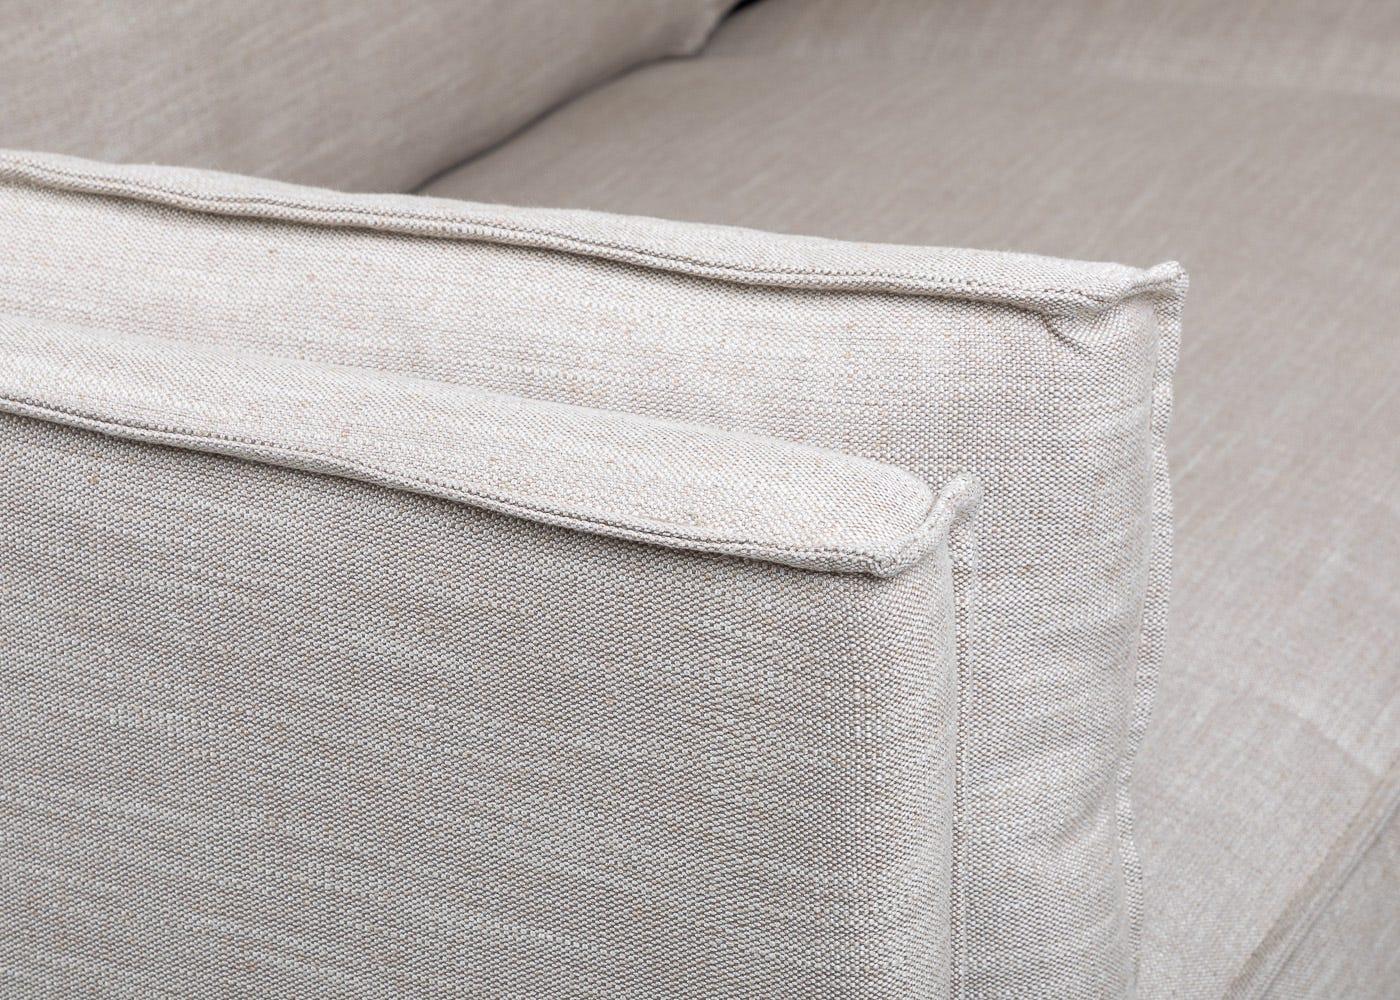 Tortona 4 Seater Sofa in Broad Weave Putty - Arm